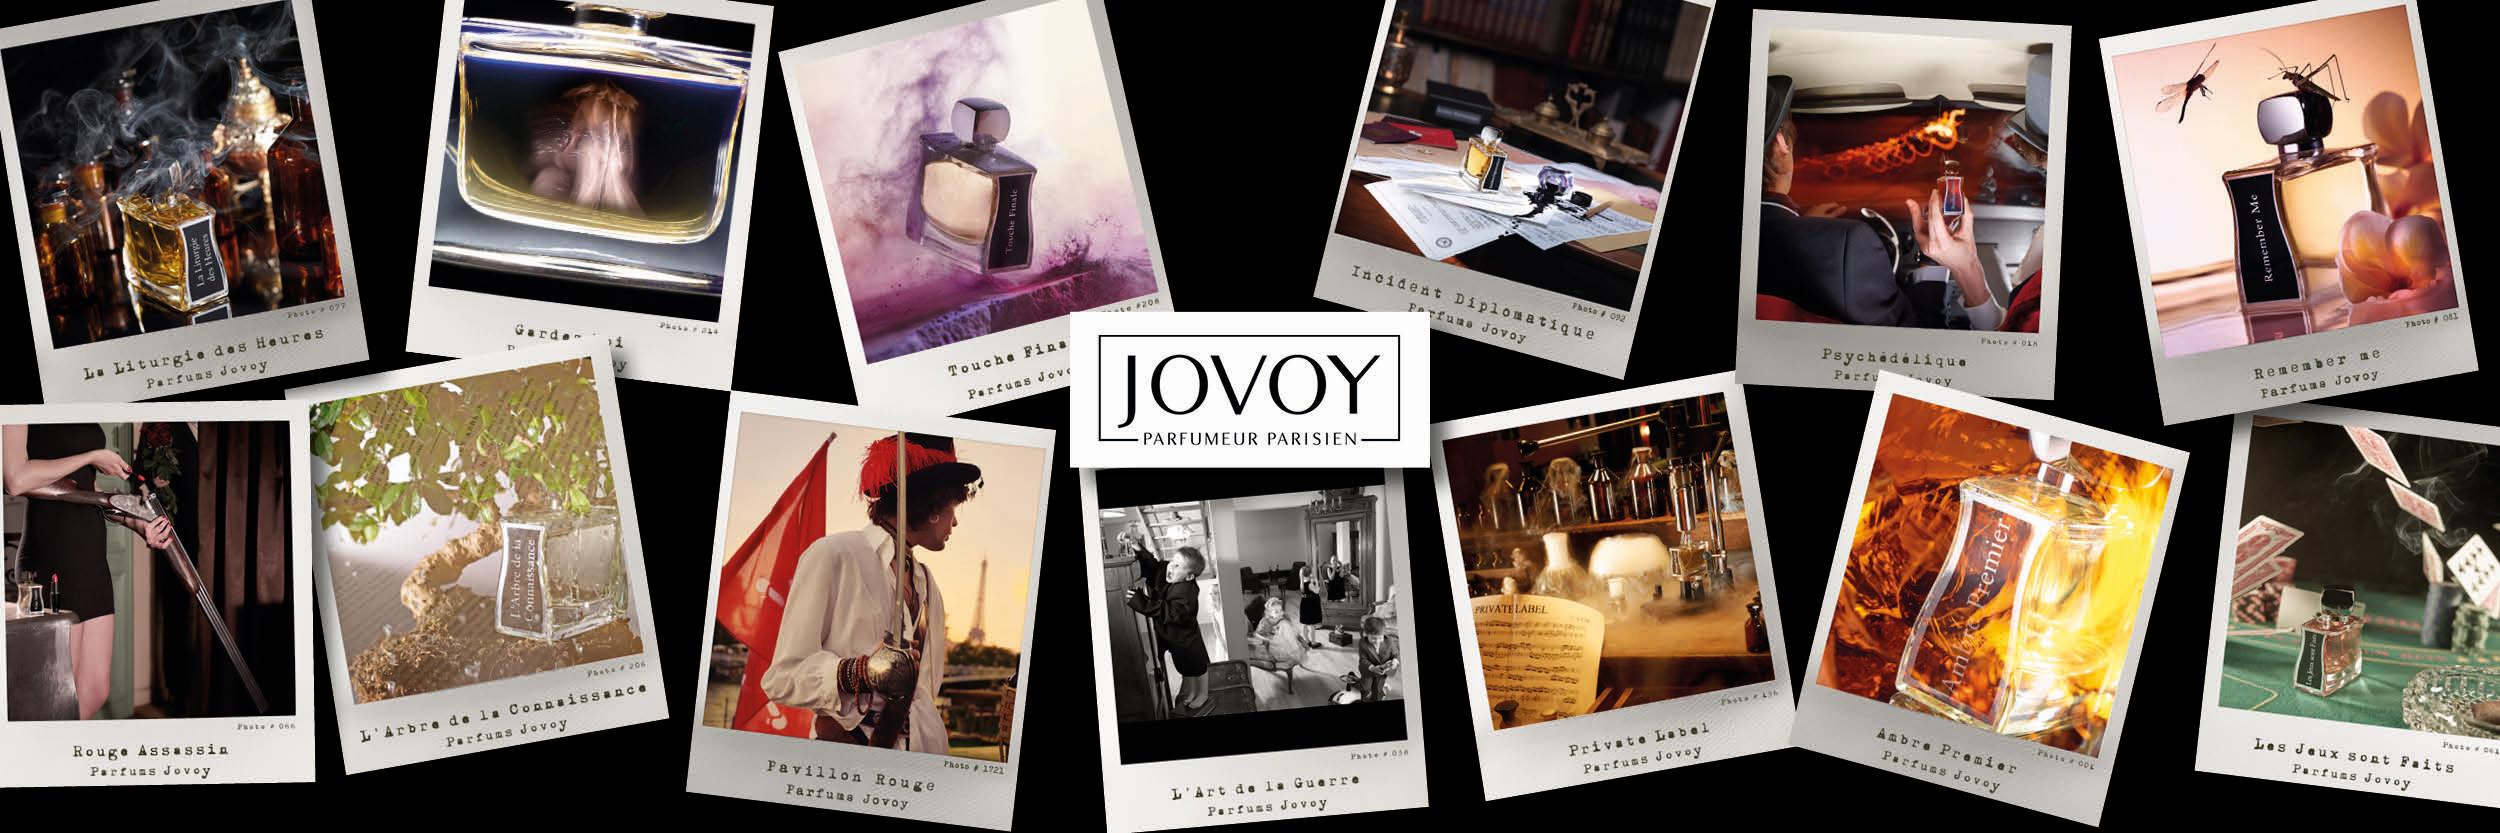 Jovoy